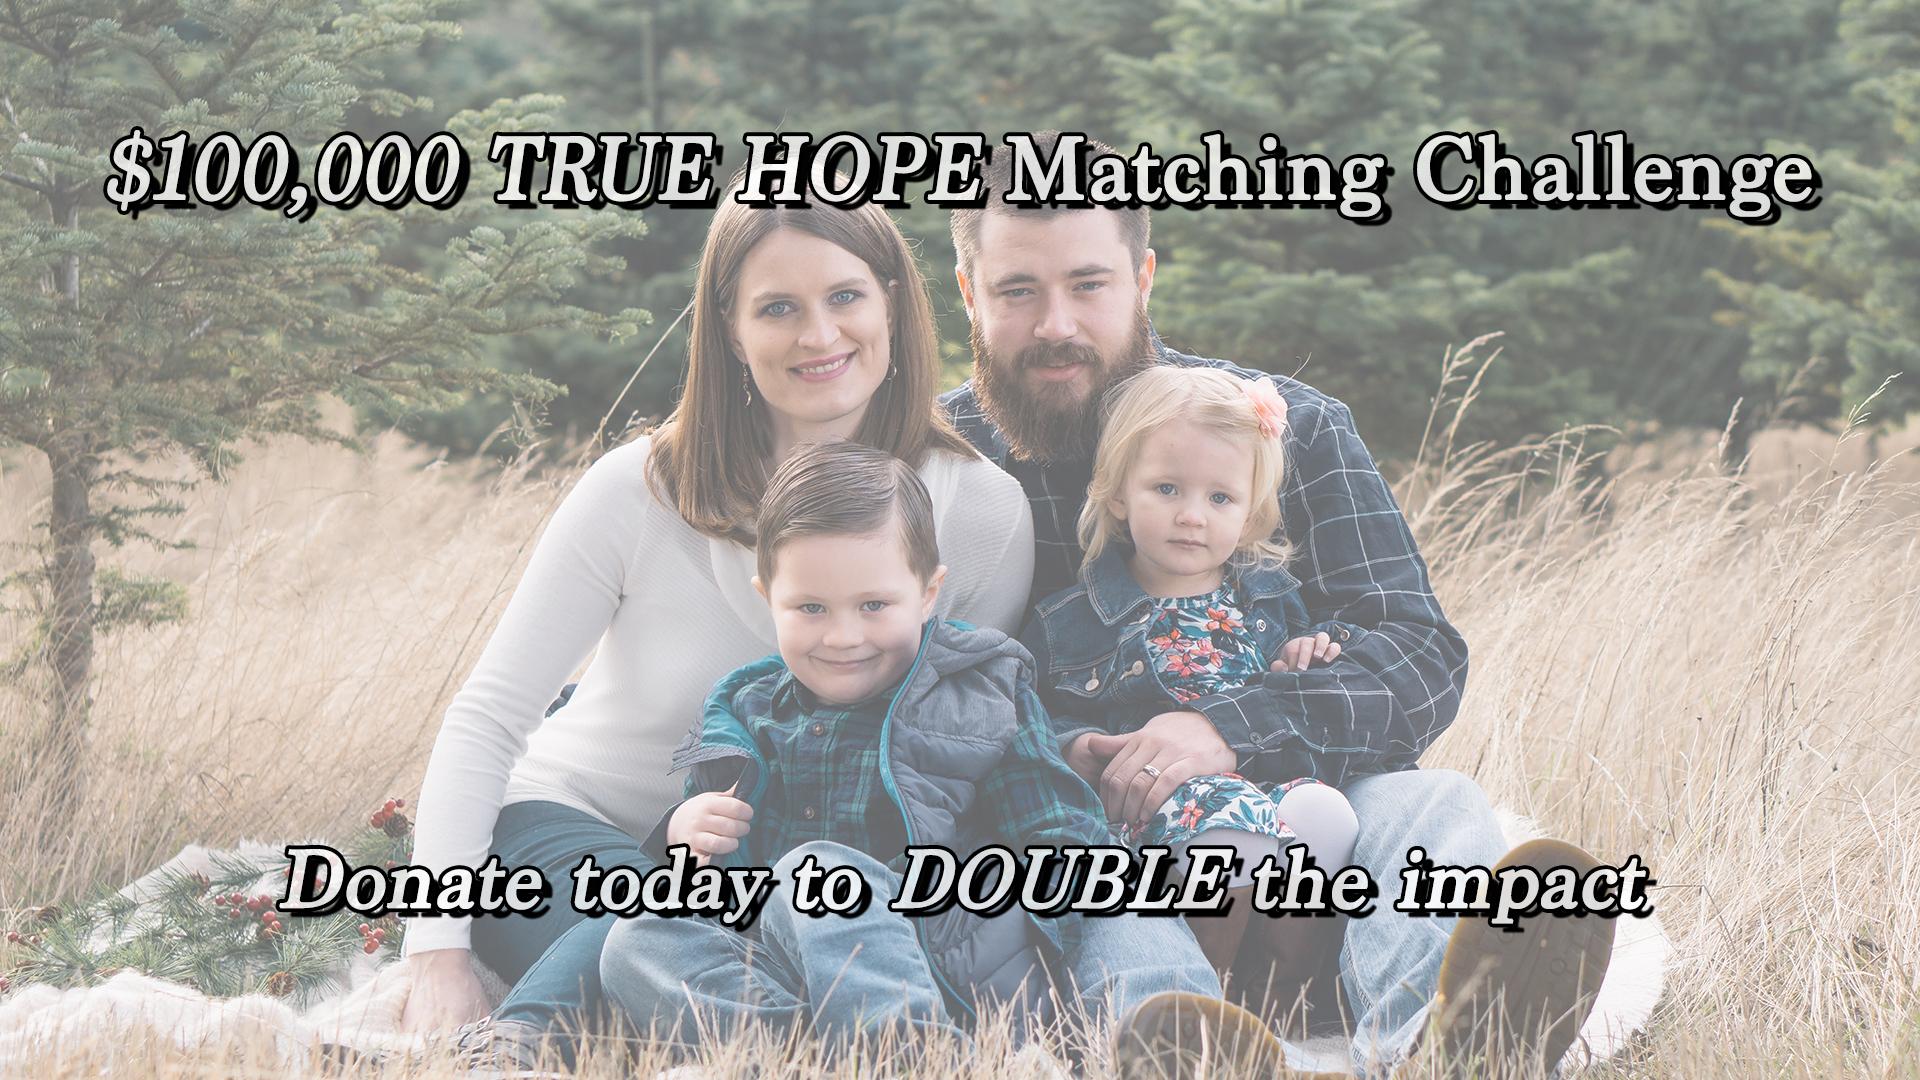 $100,000 TRUE HOPE Matching Challenge!